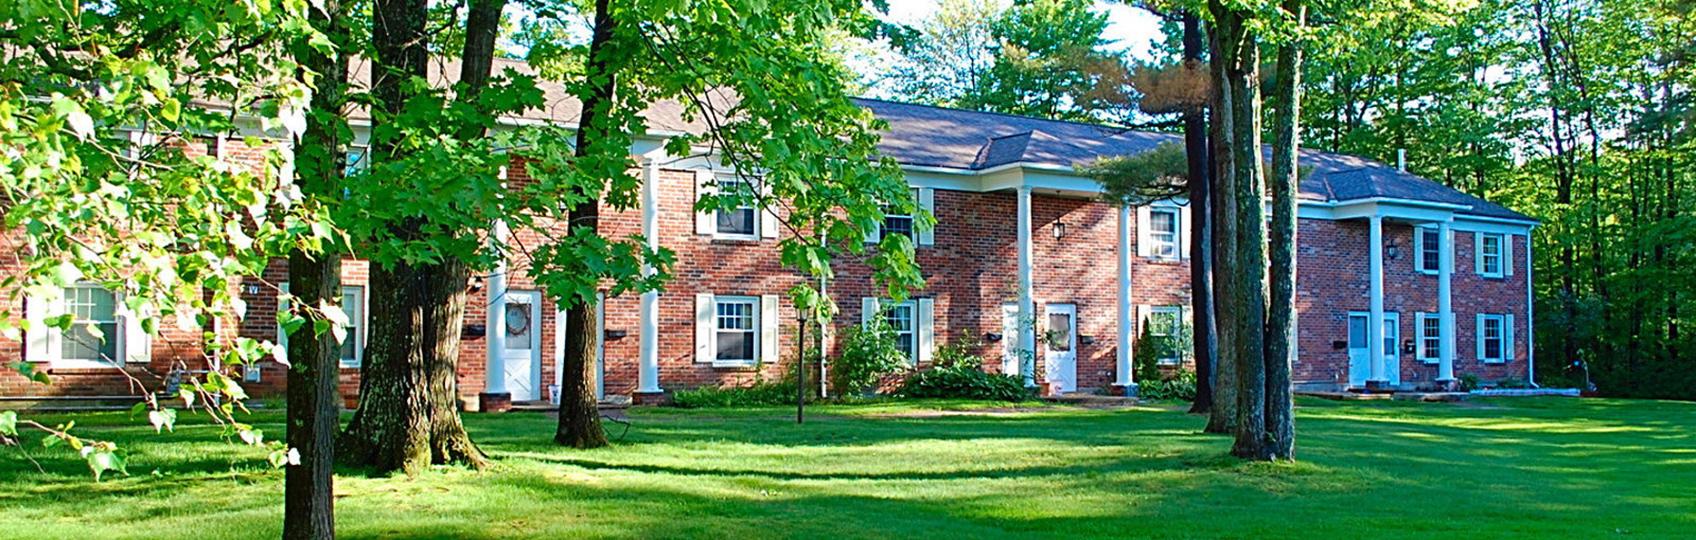 Town Squares Condos For Sale in South Burlington VT